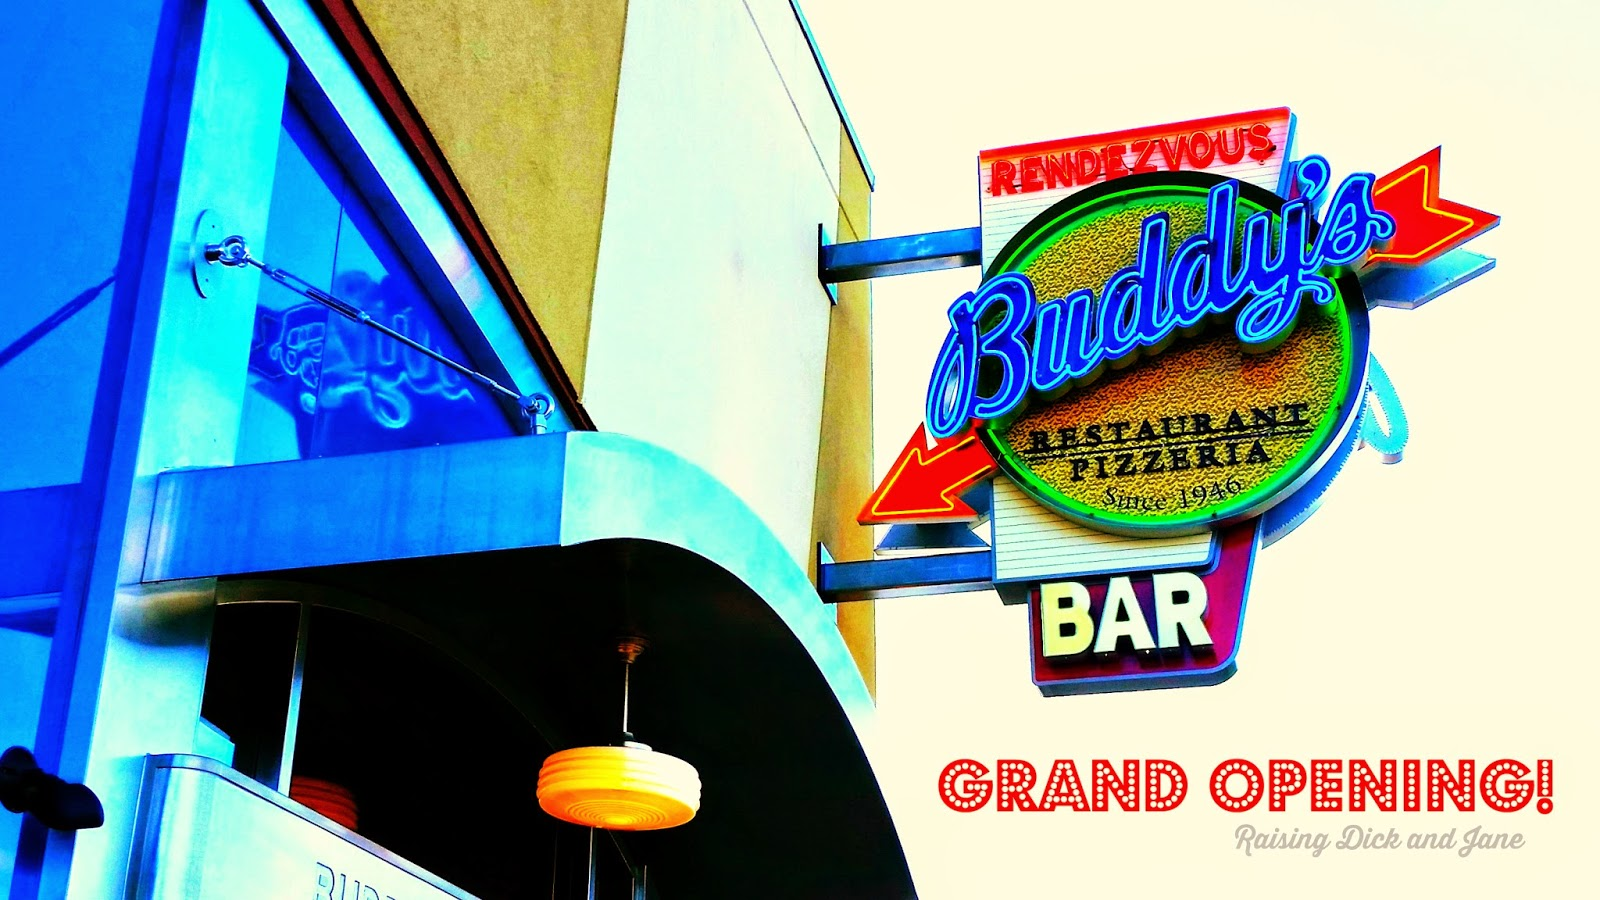 #buddysNovi Grand Opening of Buddy's Pizza in Novi Michigan